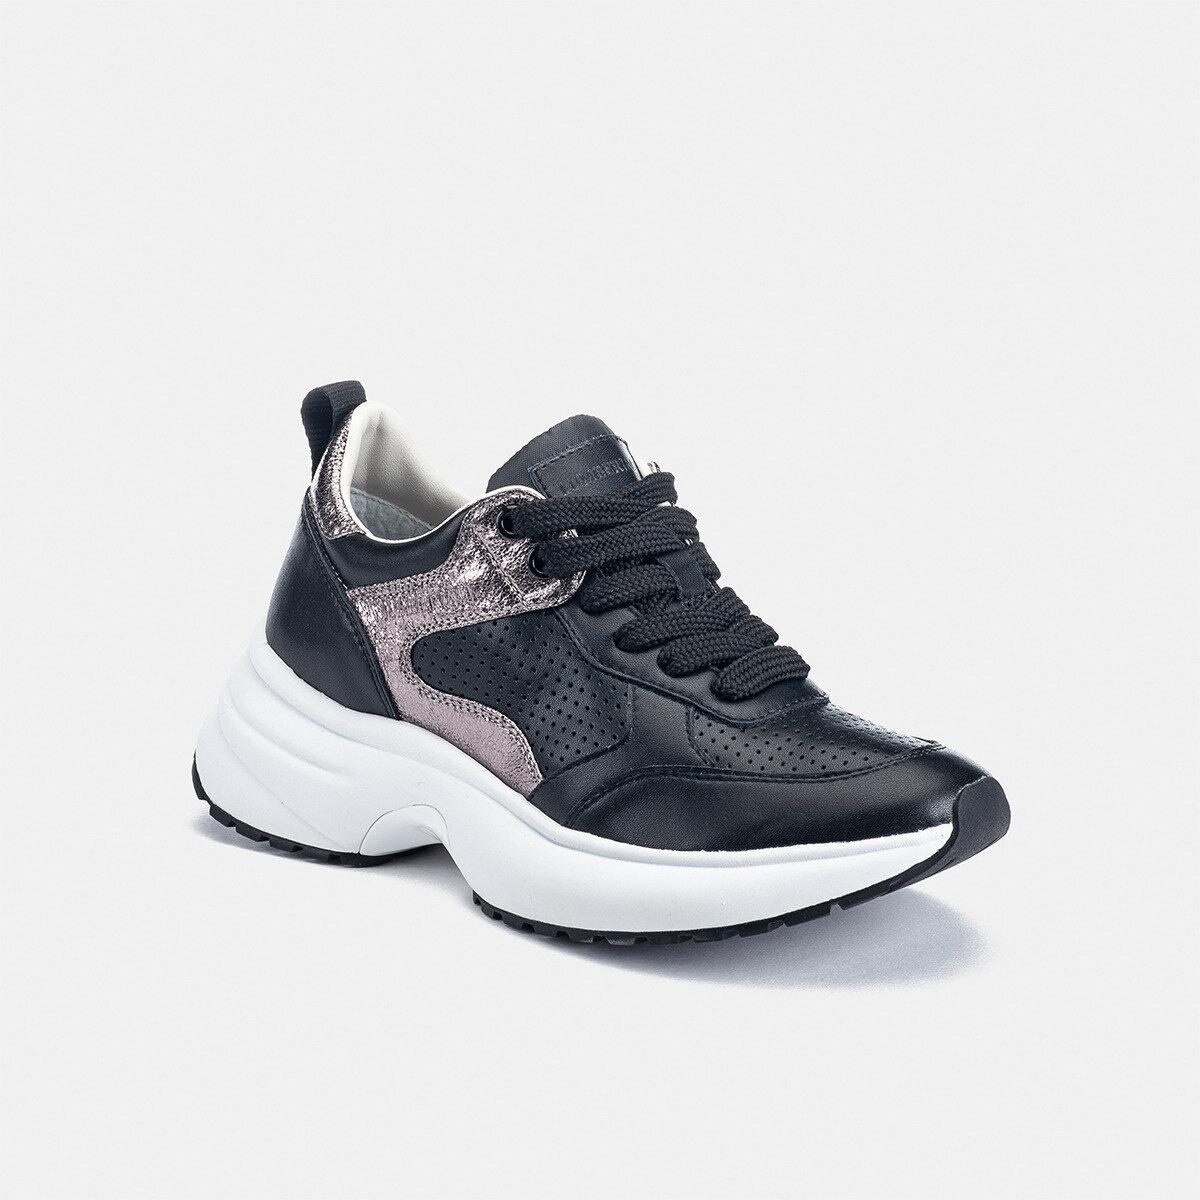 JADEN BLACK Woman Sneakers